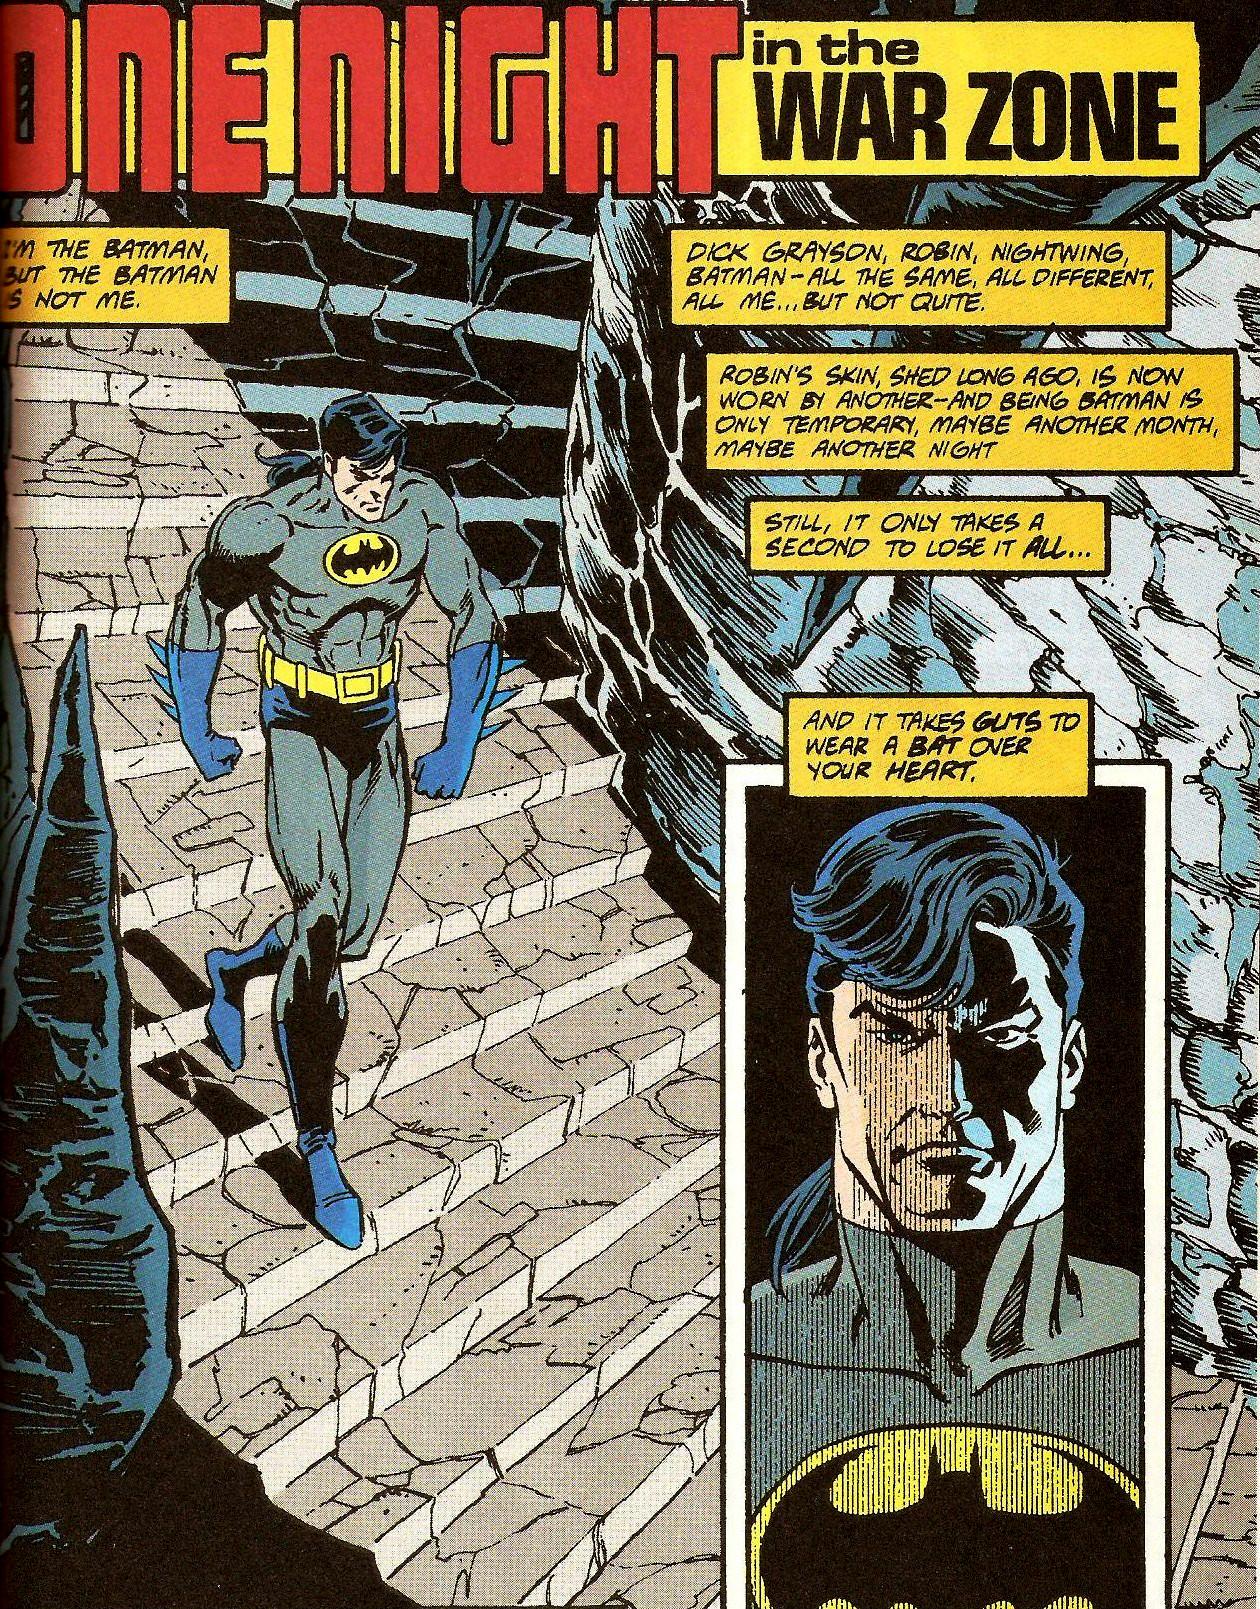 From Batman (Vol. 1) #514 (1995)